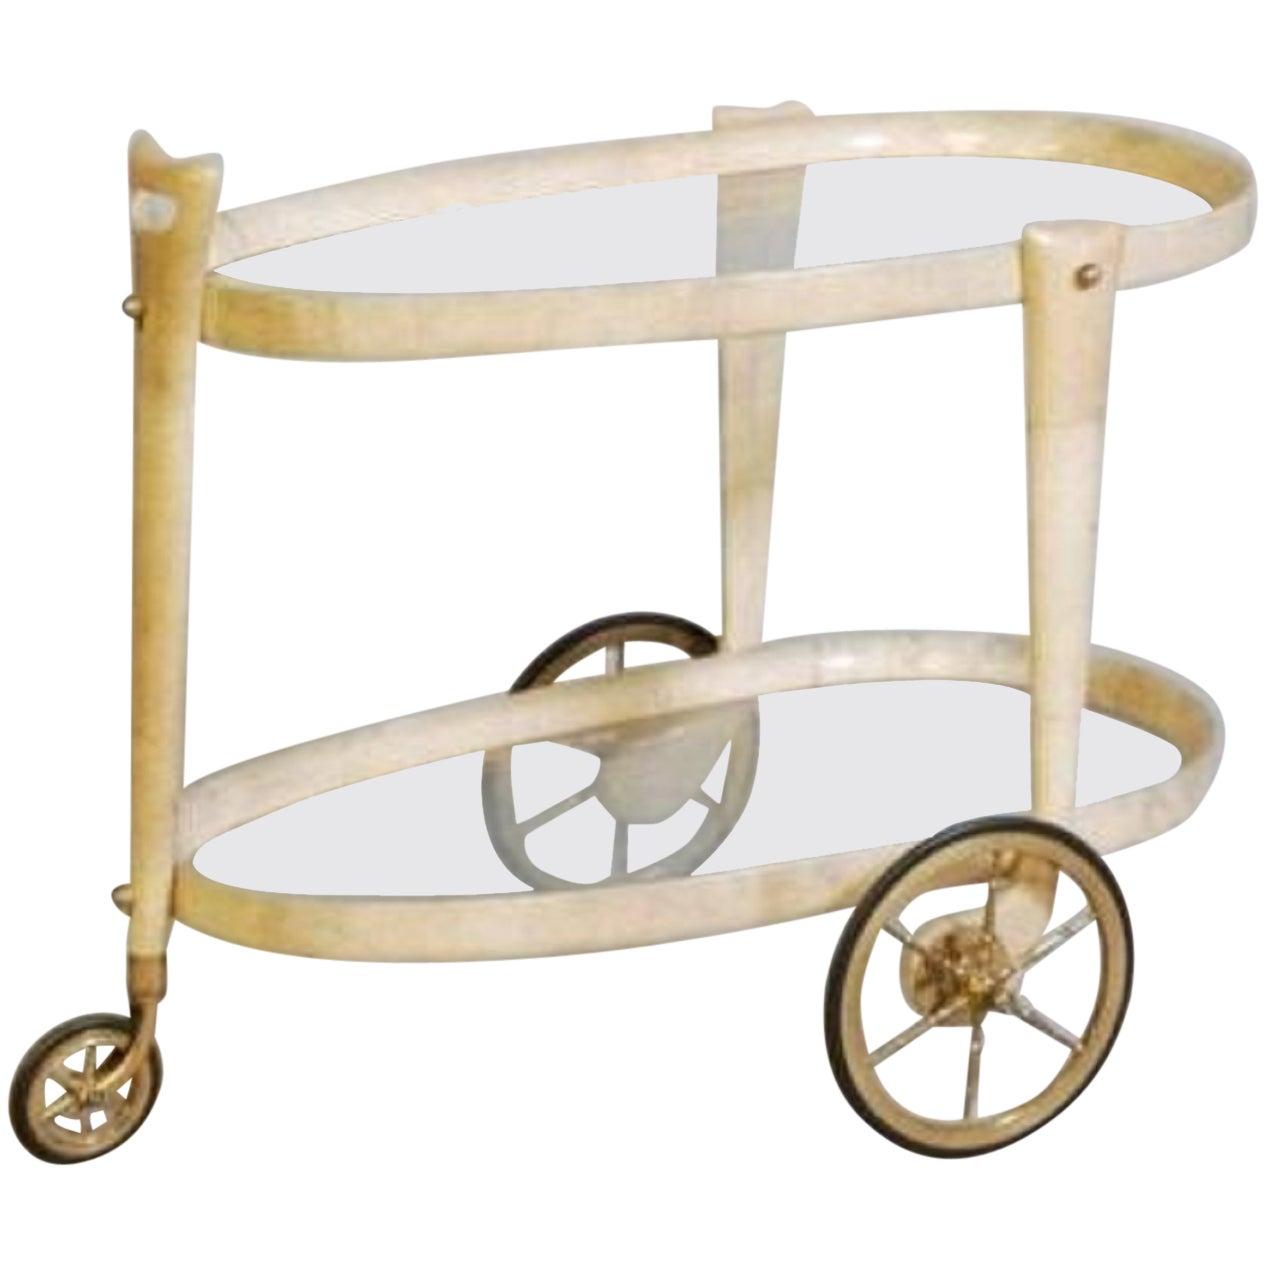 A Rare and Unusual Aldo Tura Bar Cart